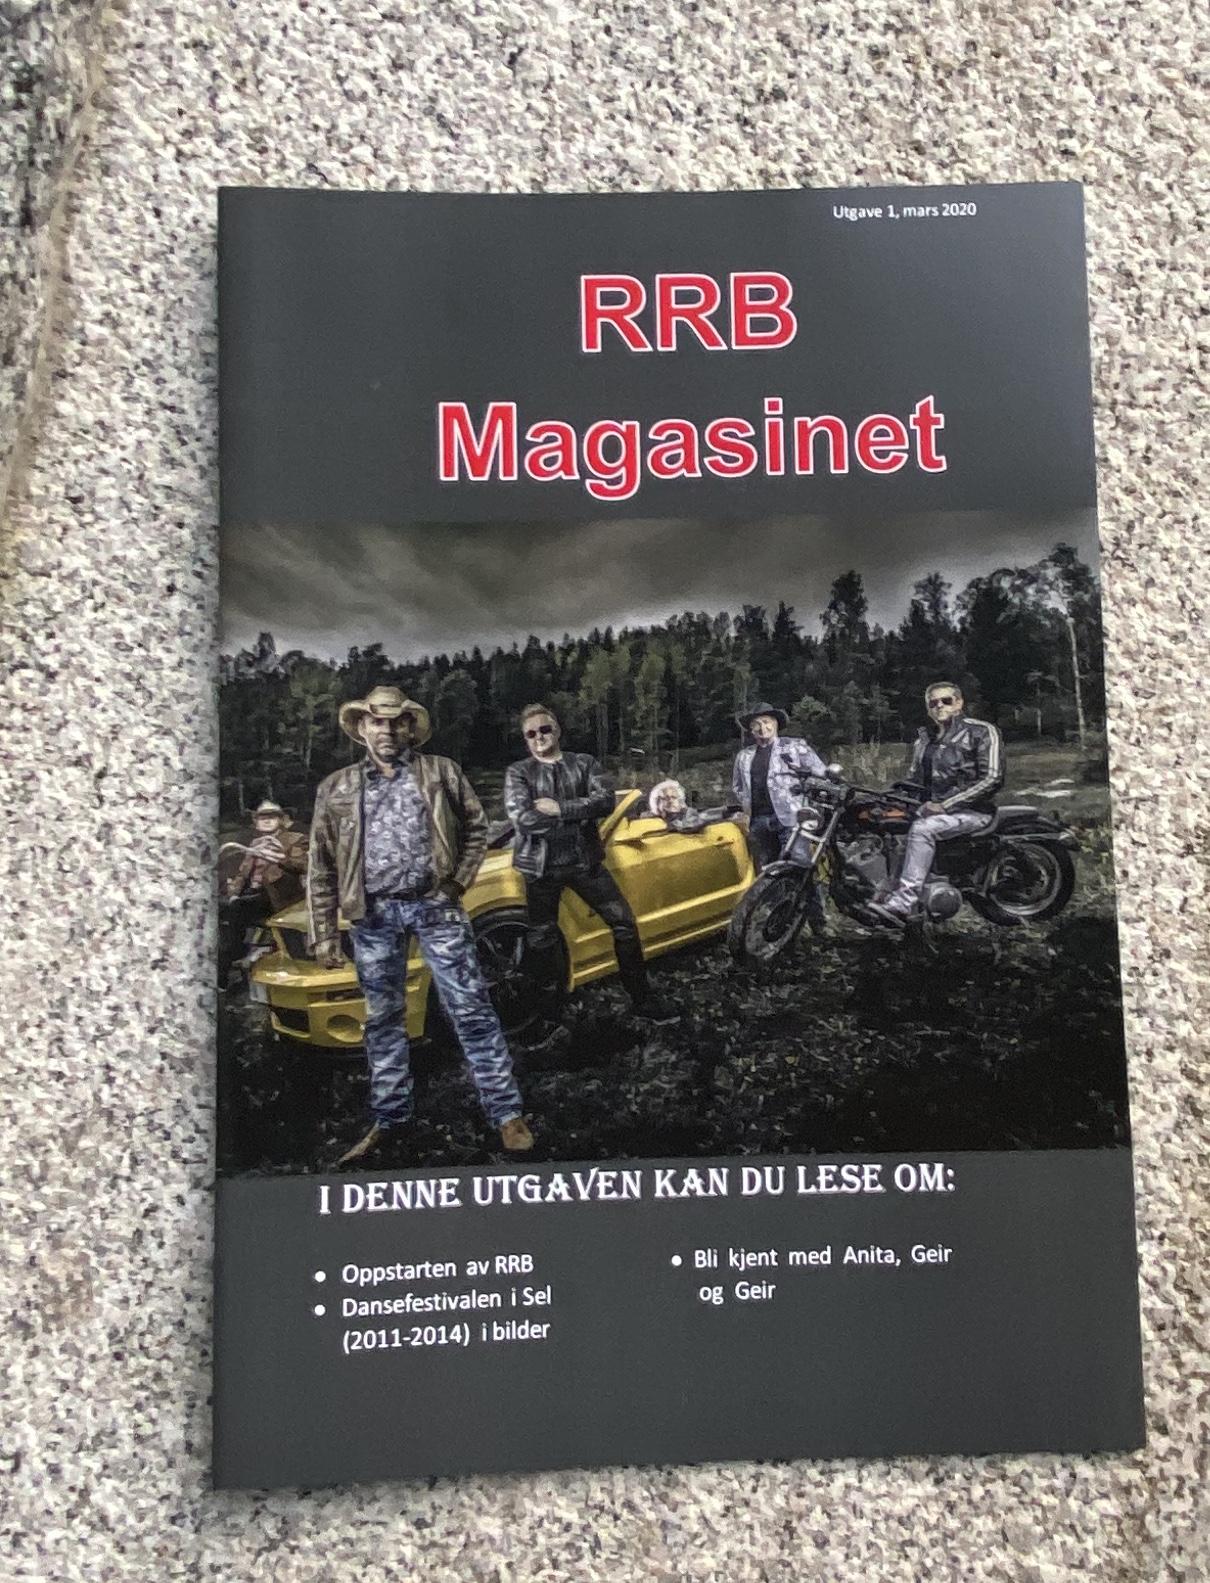 RRB Magasin utgave 1, mars 2020